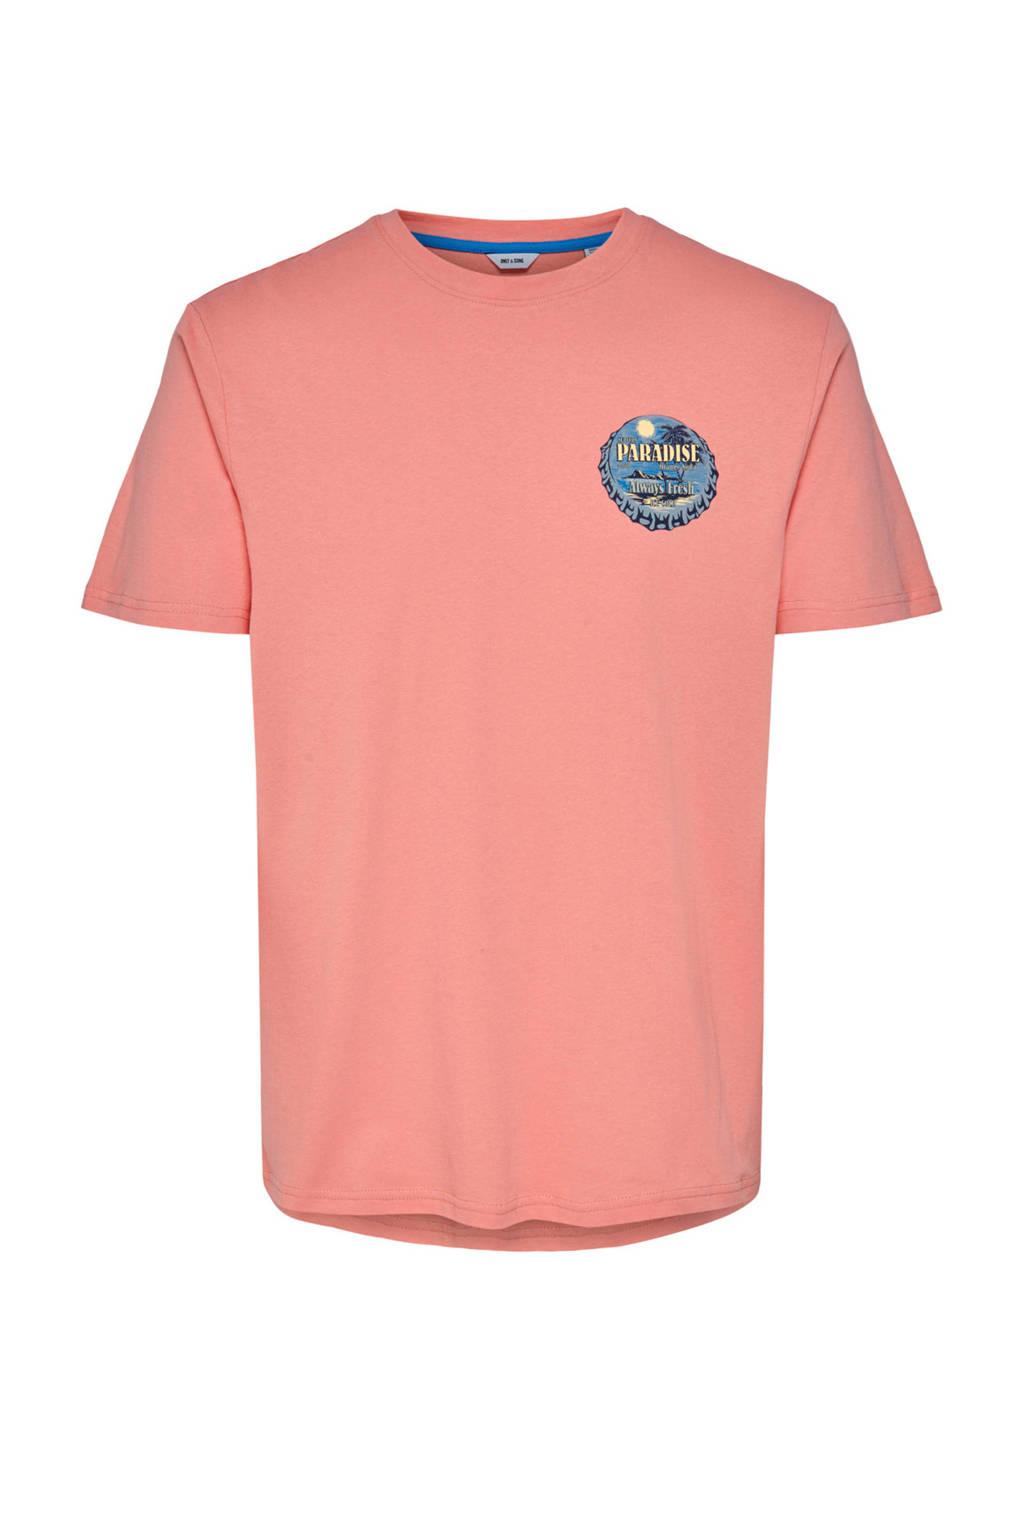 ONLY & SONS T-shirt met printopdruk zalm, Zalm